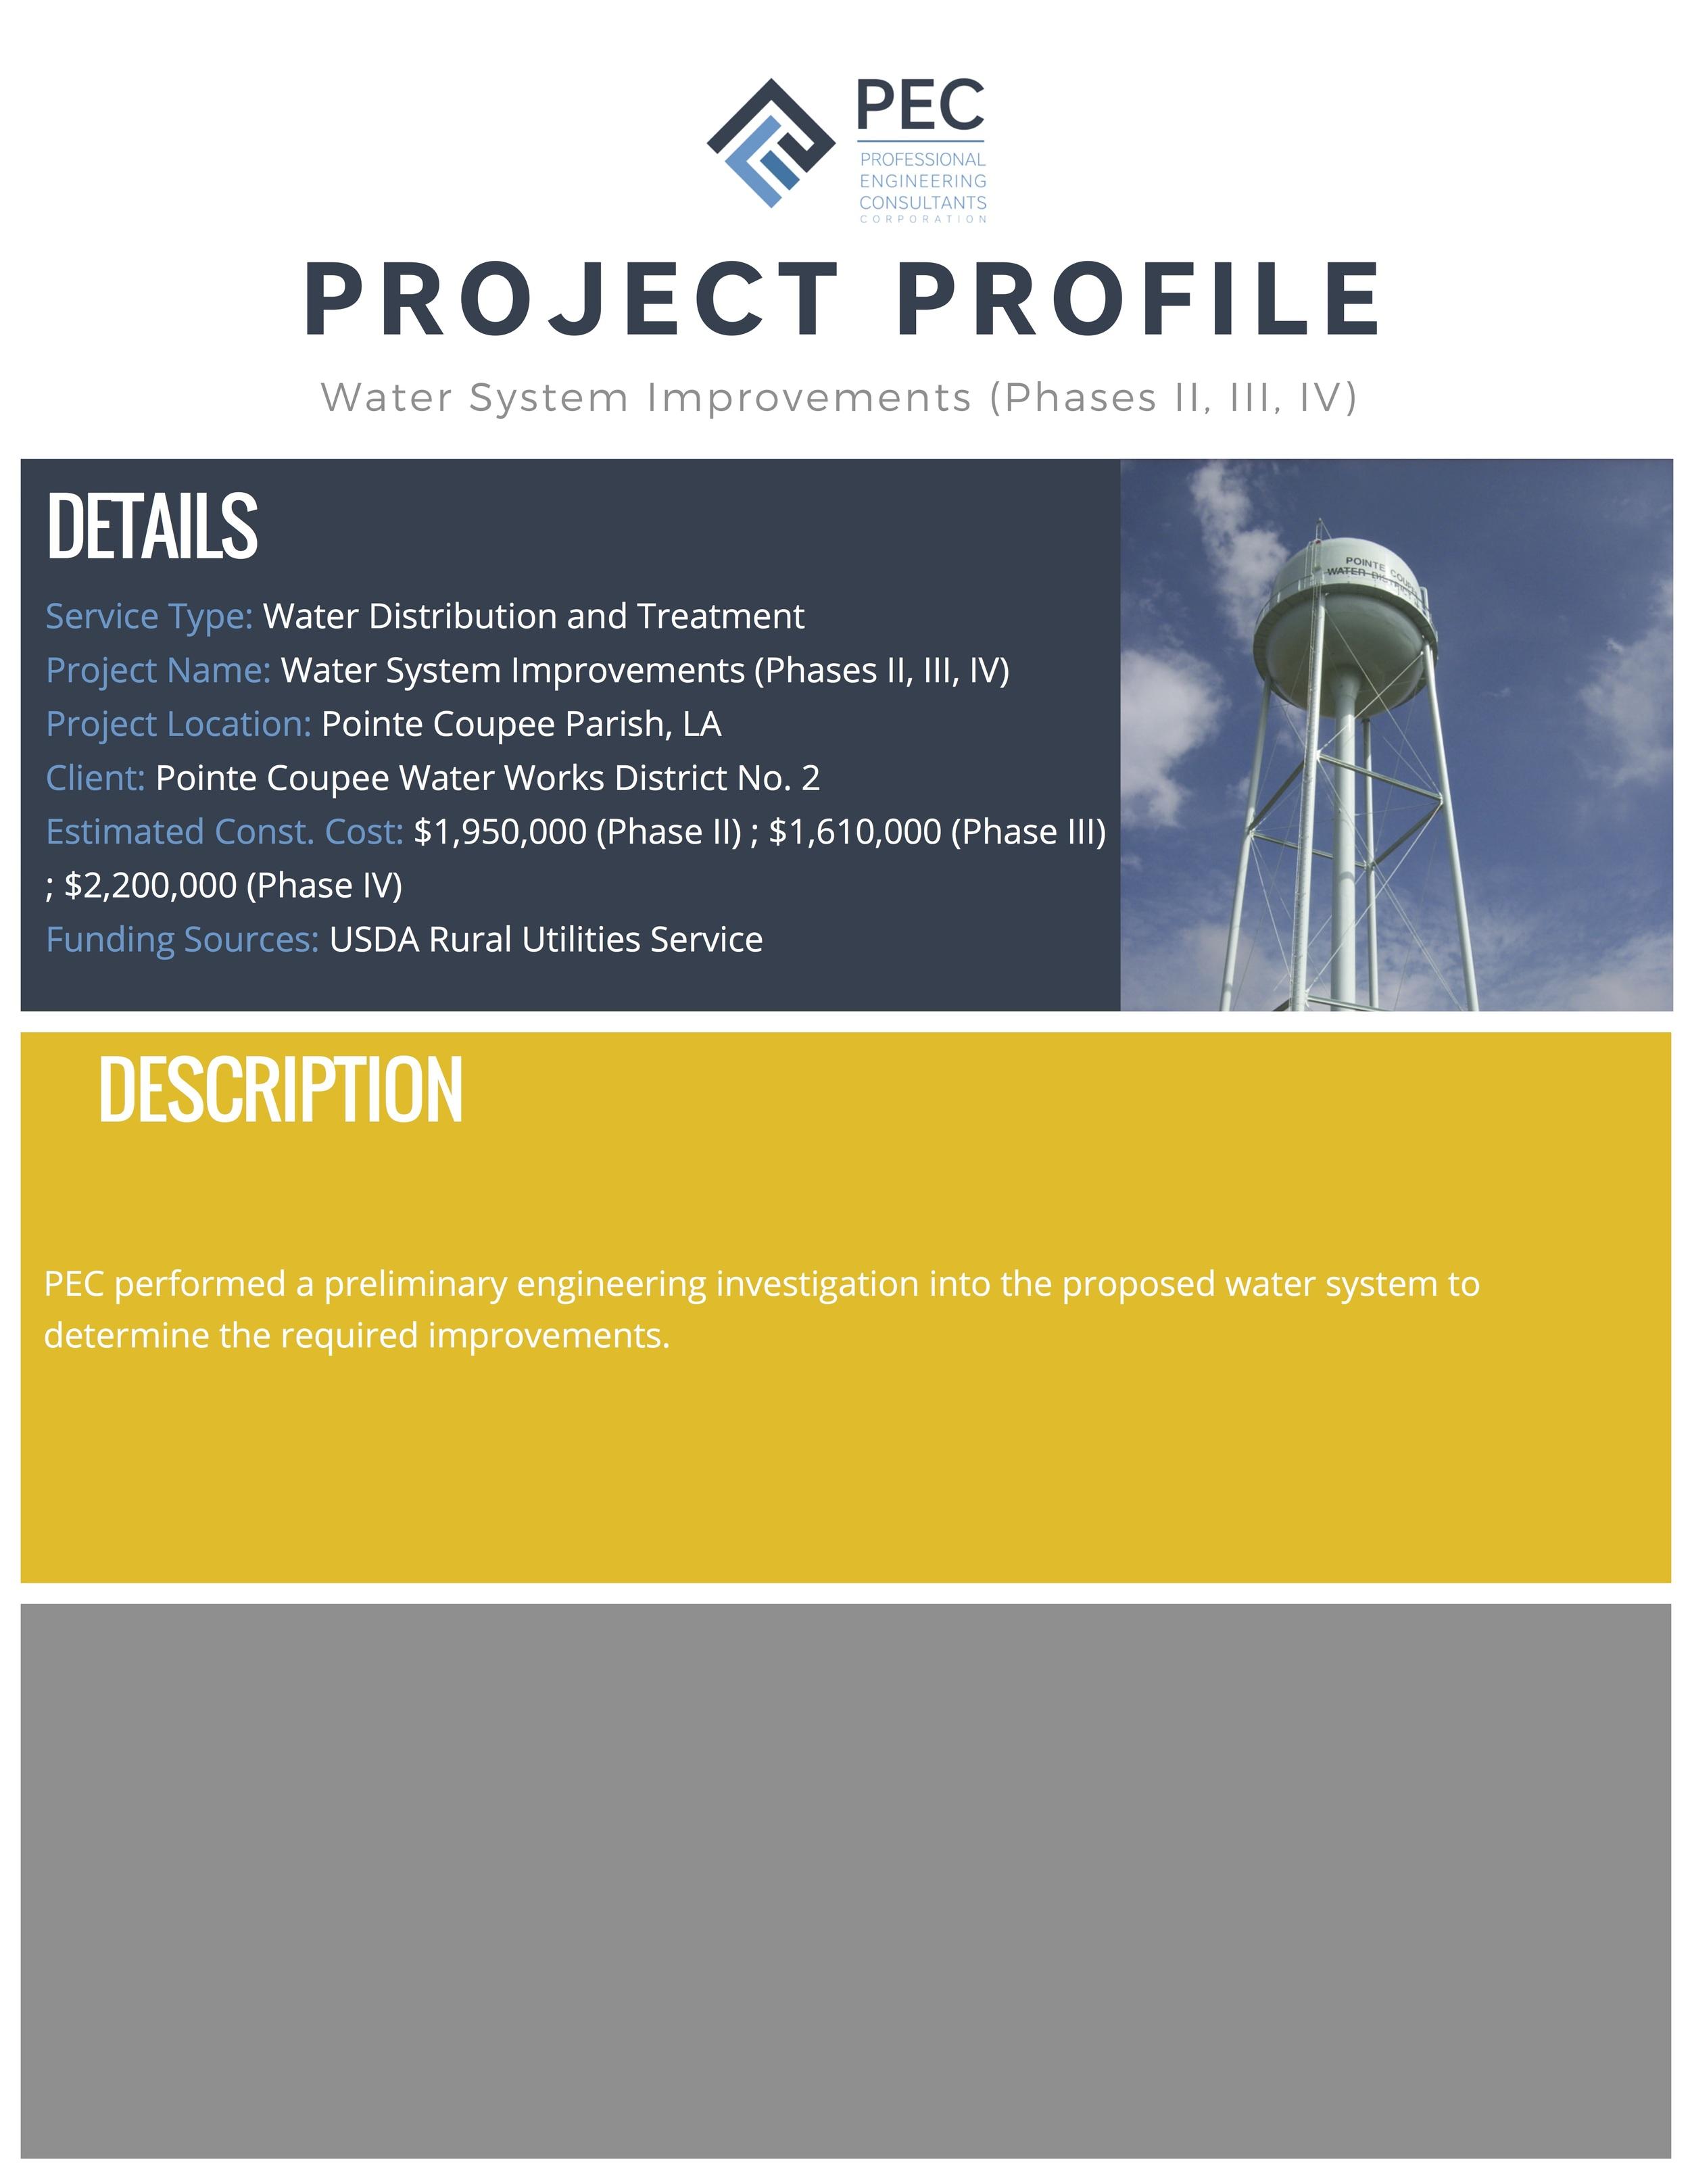 Project Profile_WaterSystemImprovementsFINAL.jpg